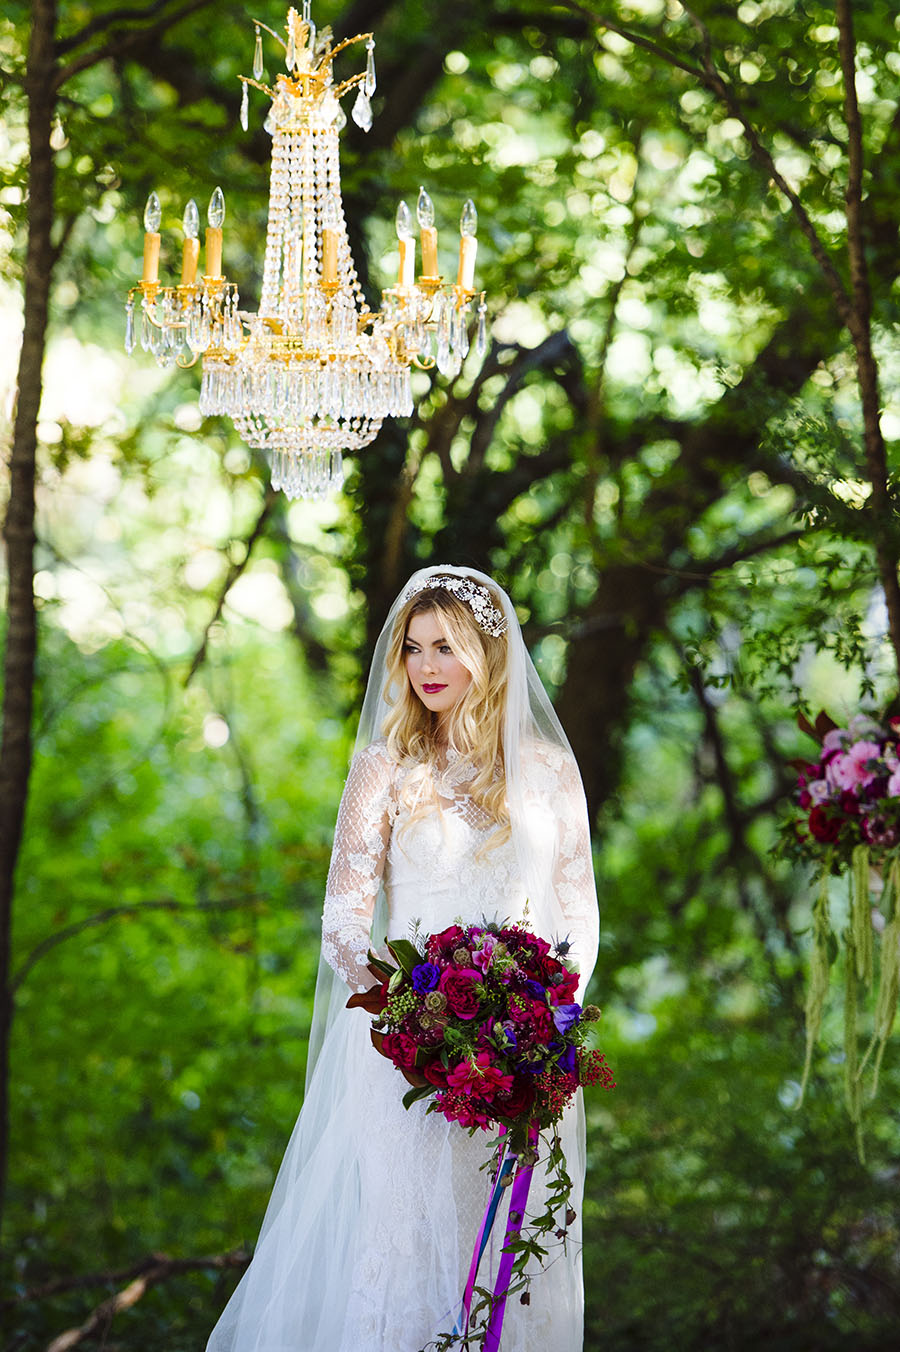 Ashley O'Dell Photography & Naomi Studio & Salon